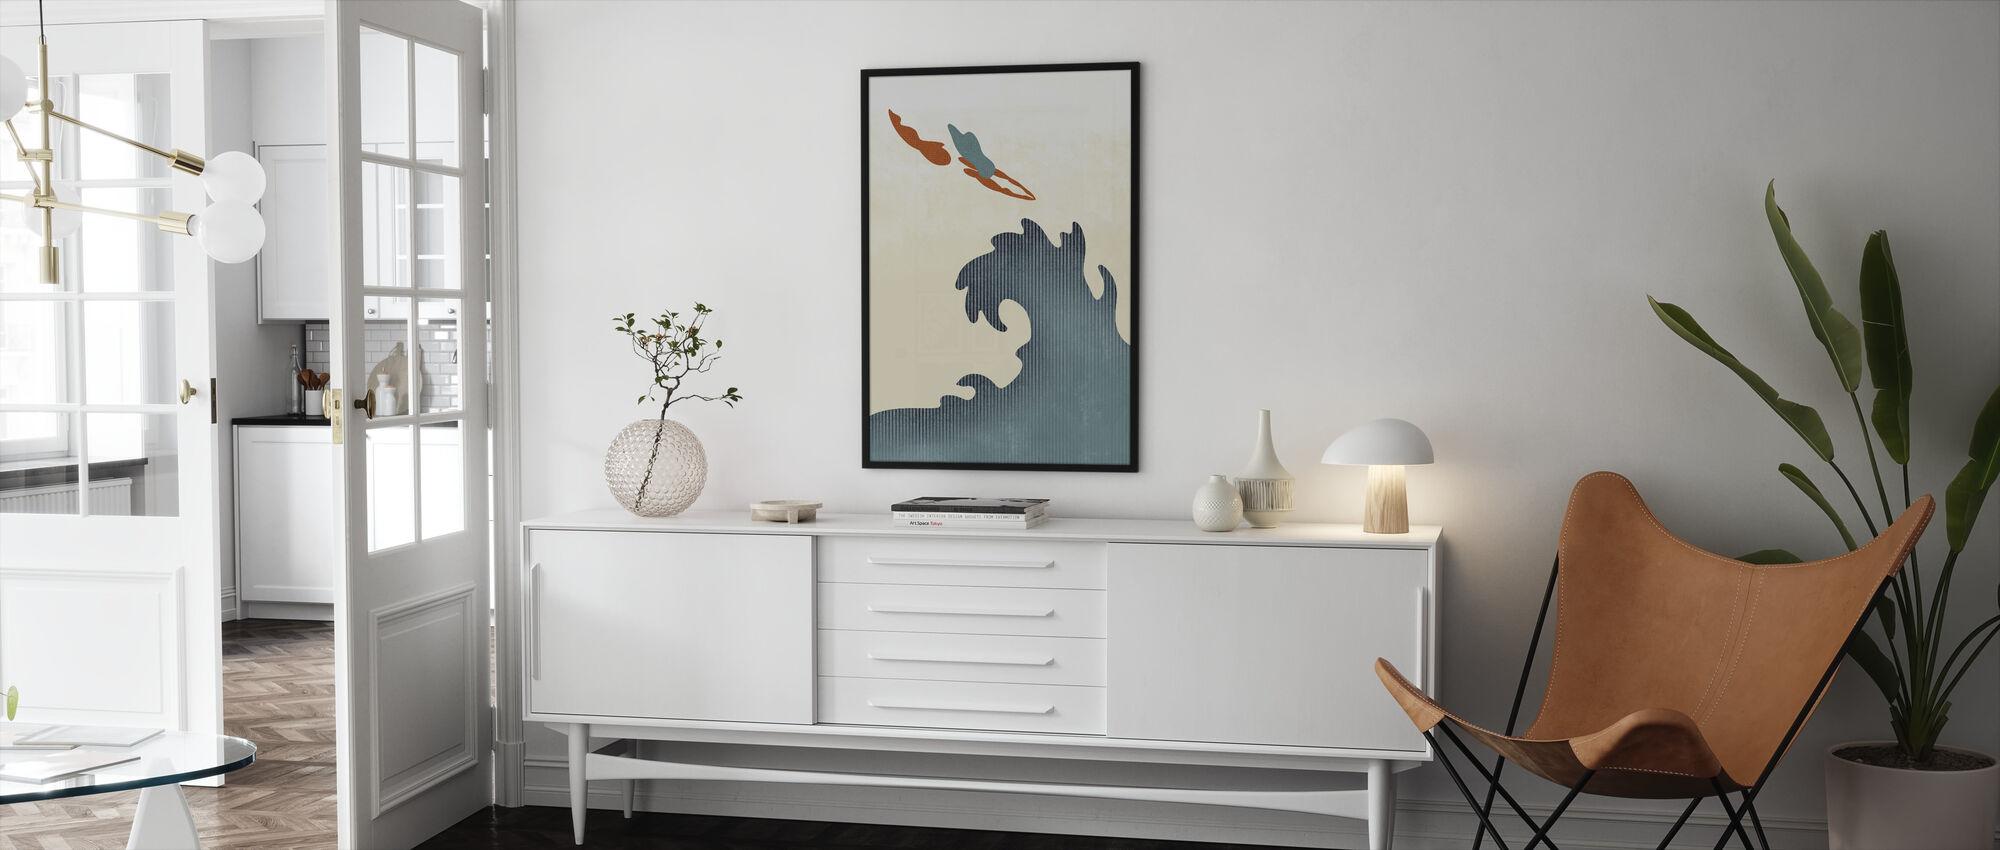 Heliga dykare - Inramad tavla - Vardagsrum